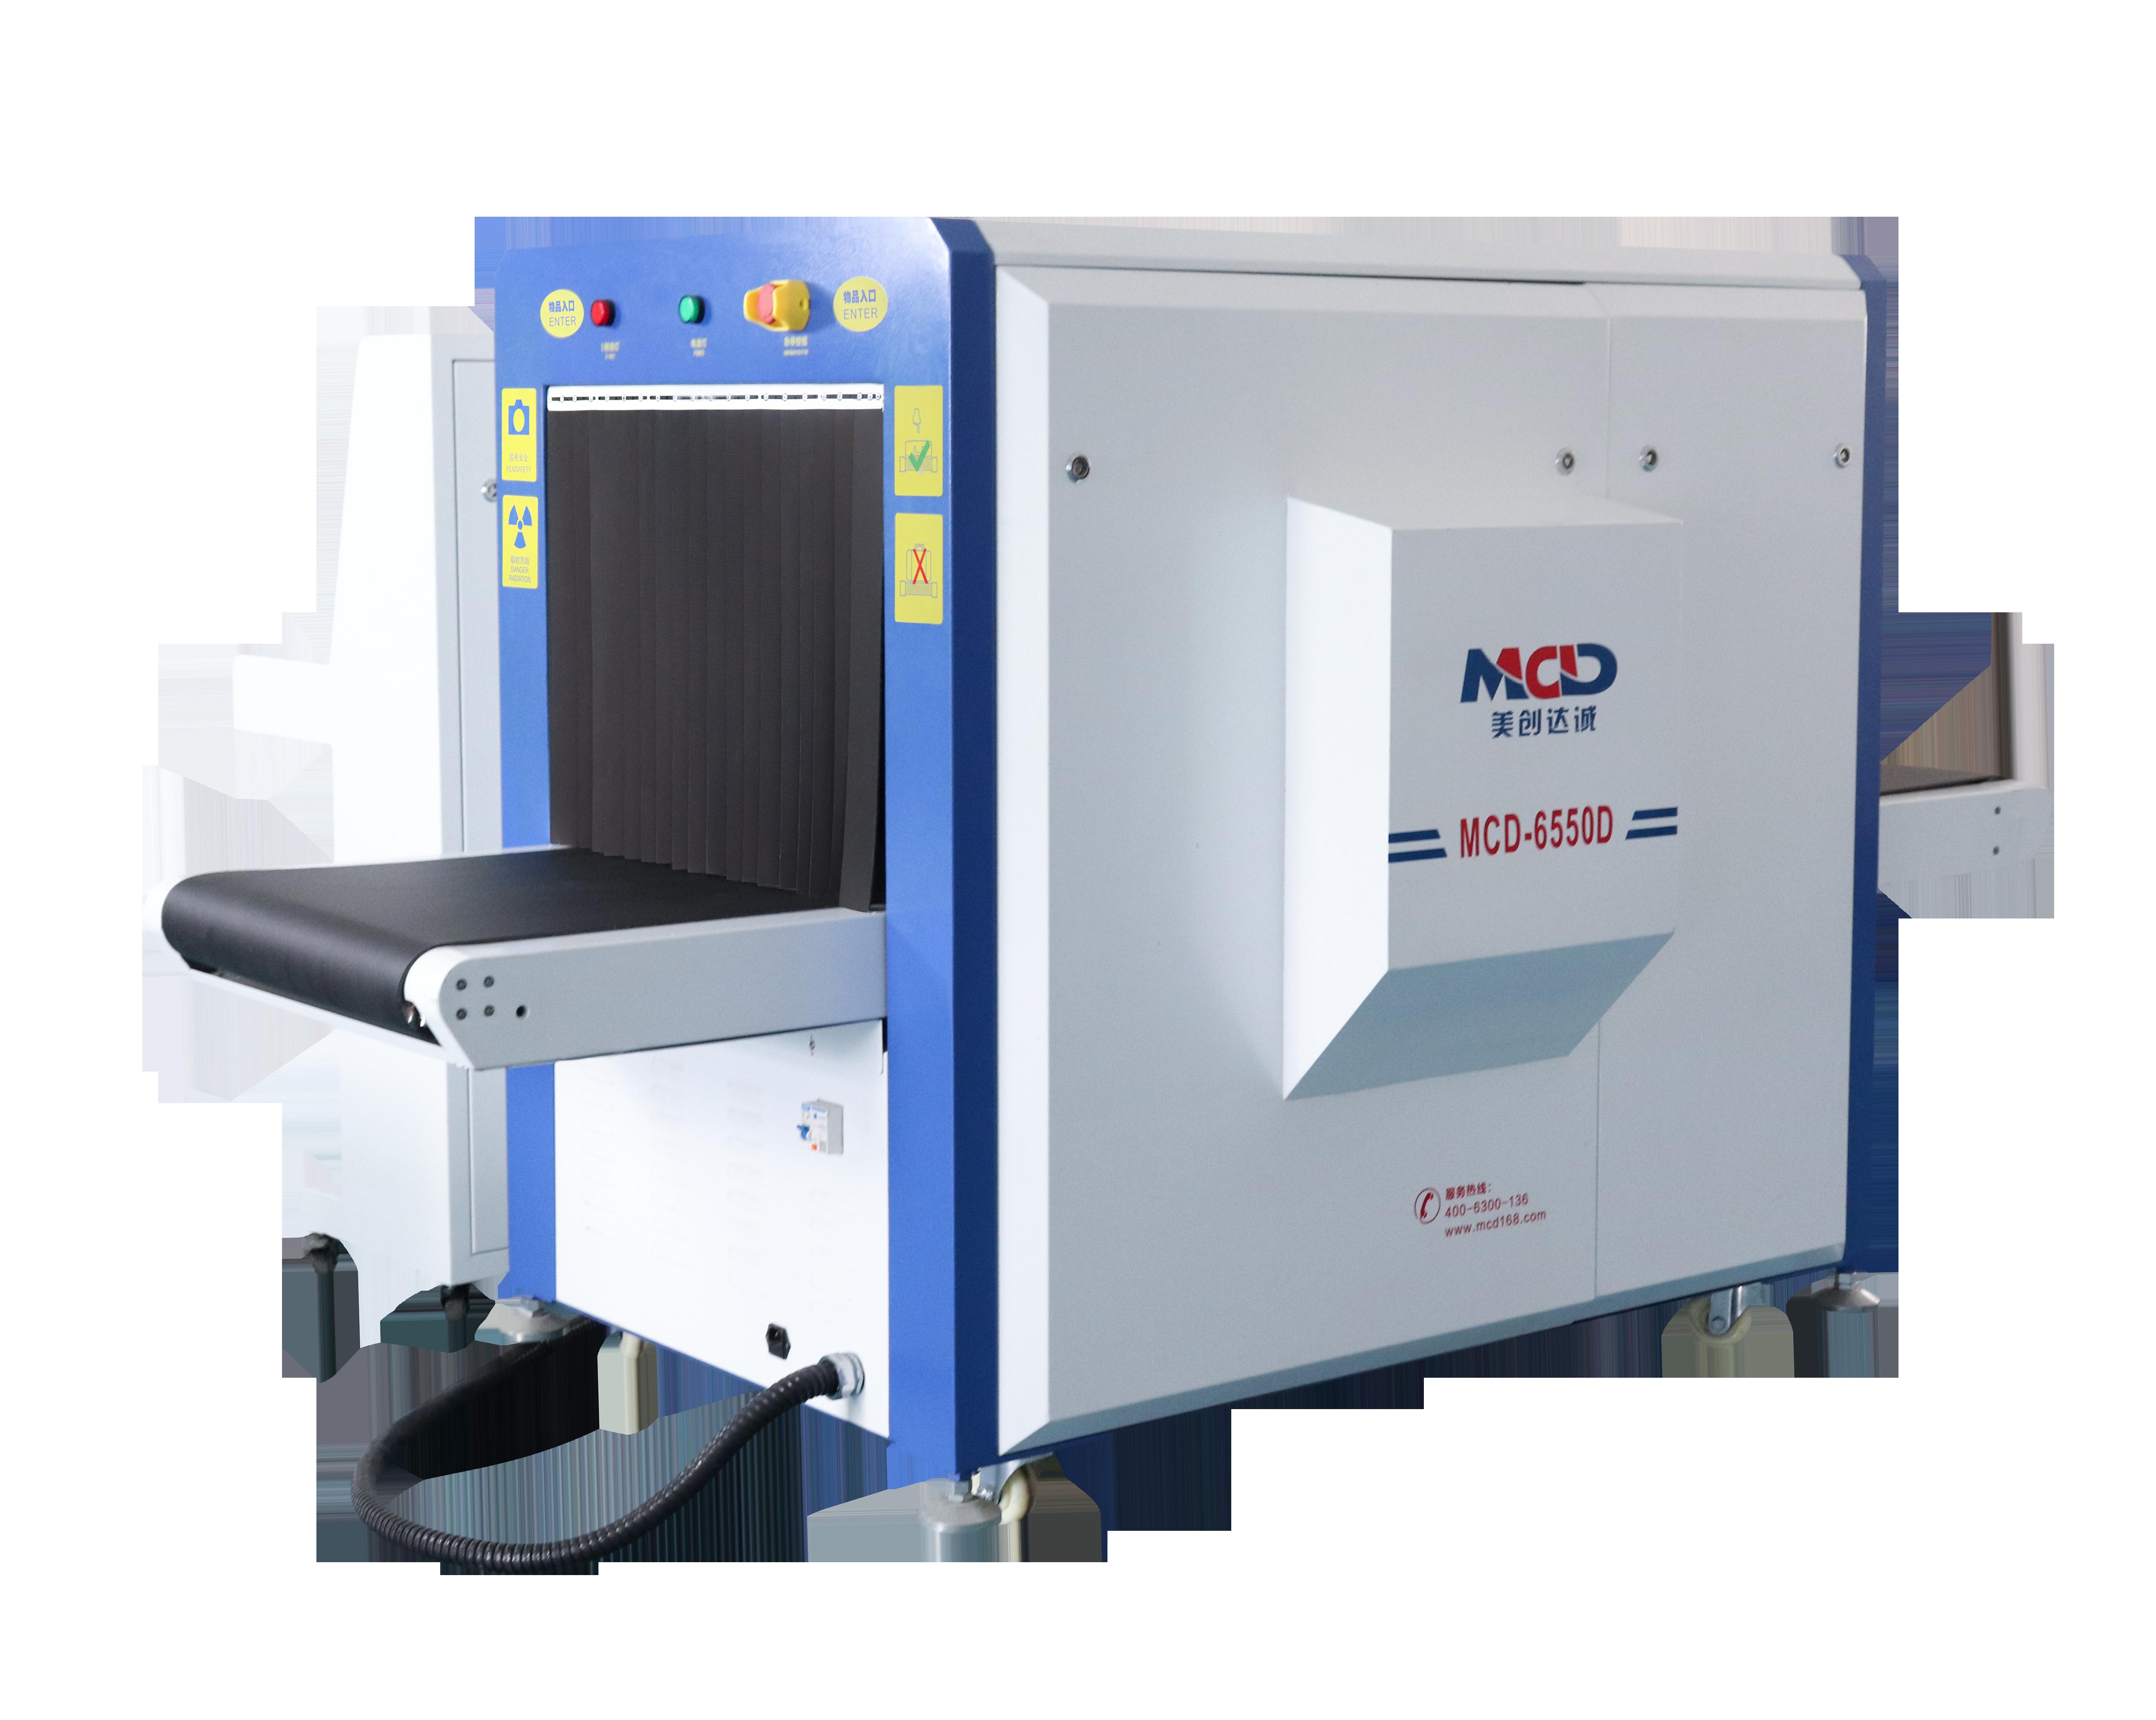 MCD-6550D,双视角安检机车站行李X光机安检设备